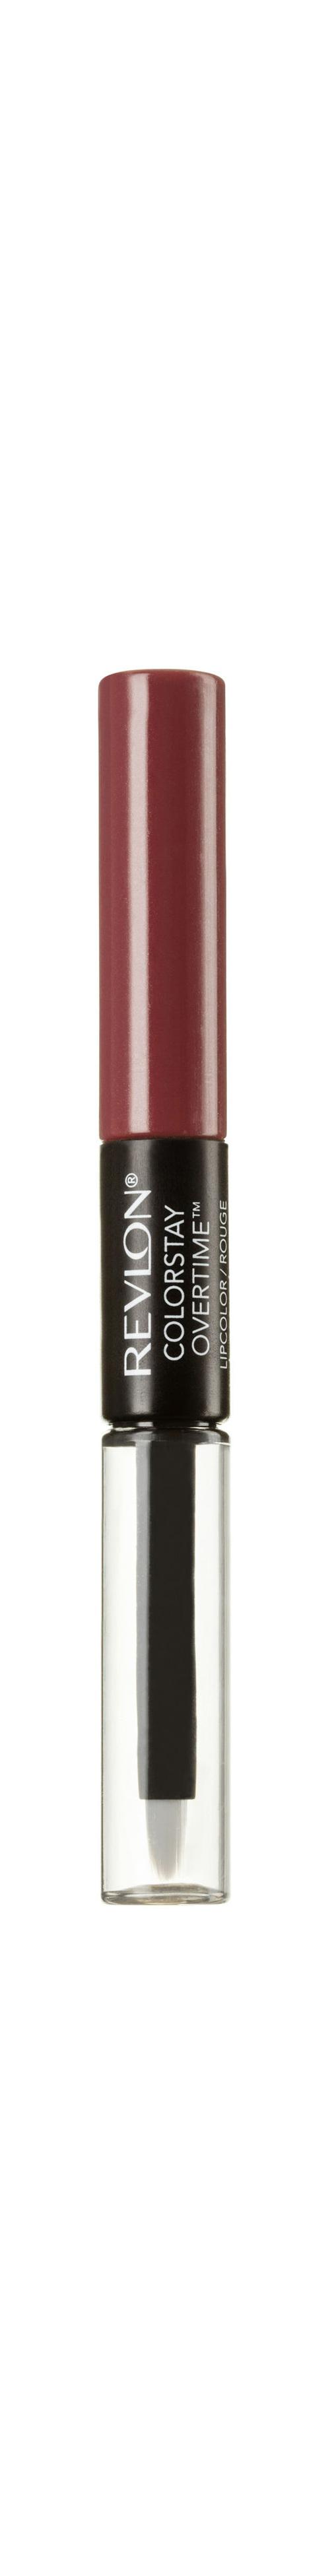 Revlon Colorstay Overtime™ Lipcolor Endless Spice